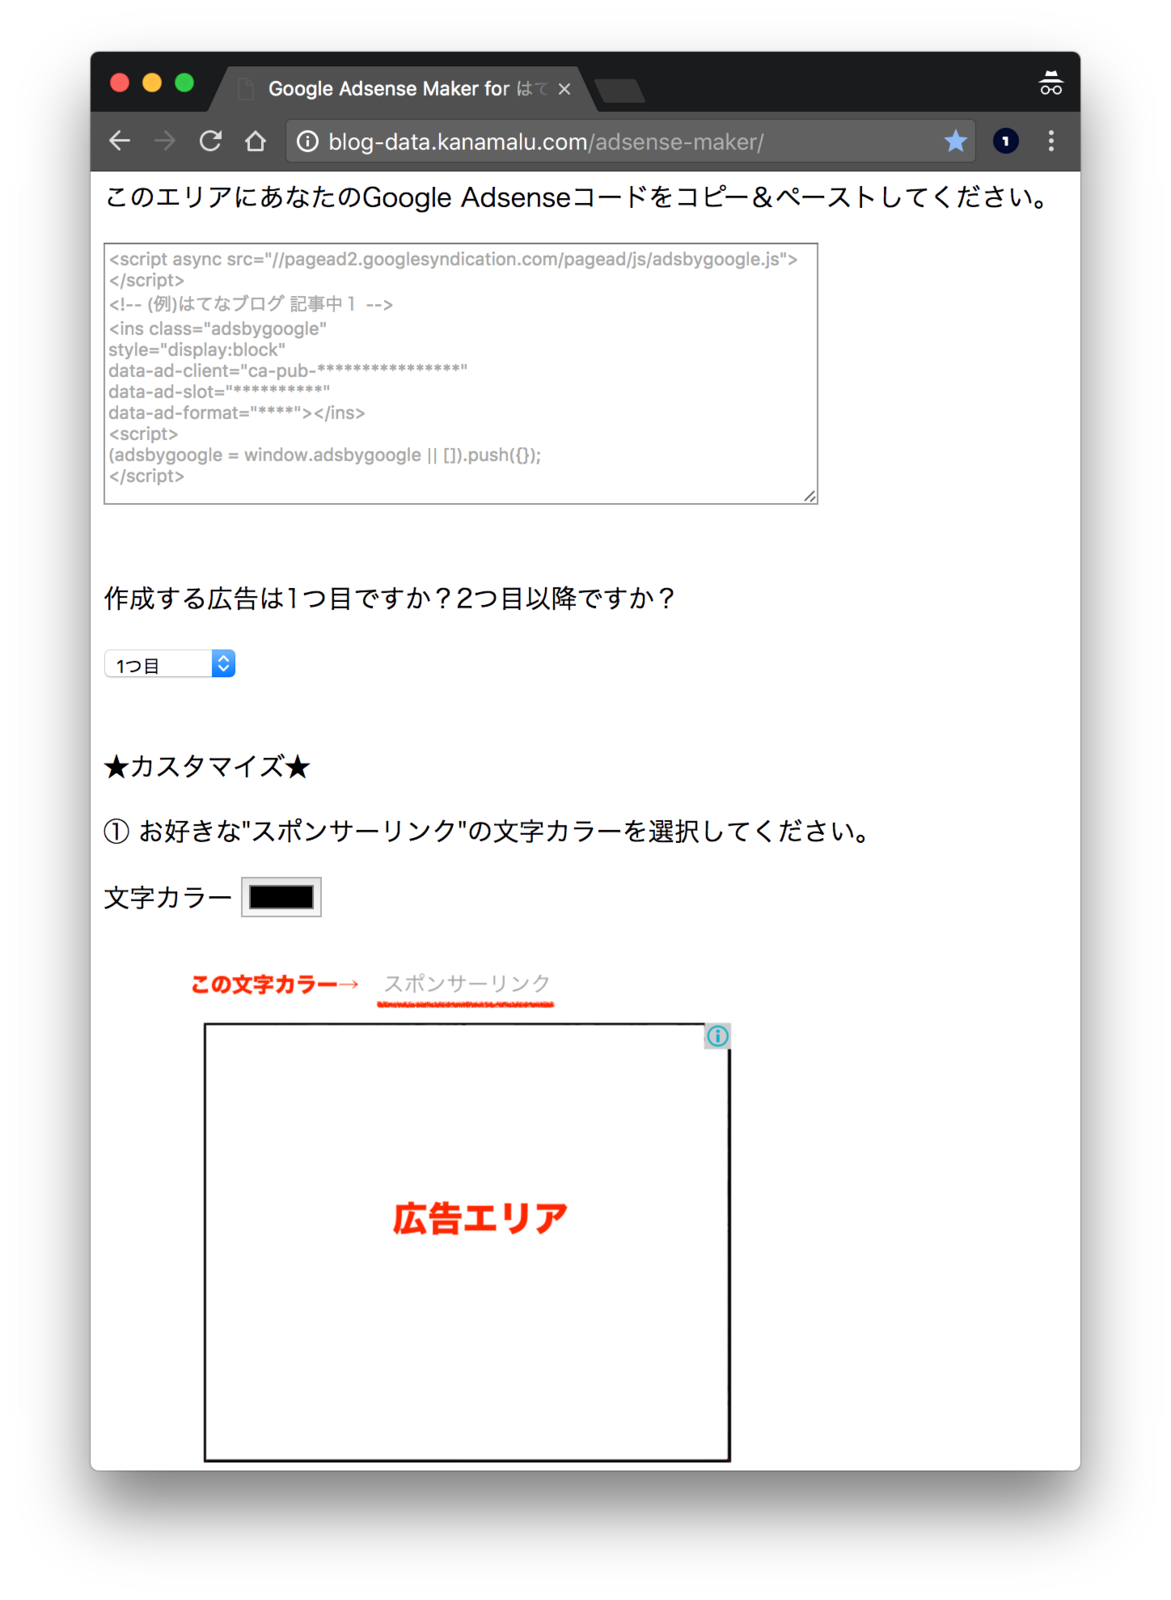 f:id:kanamalu:20170118234751p:plain